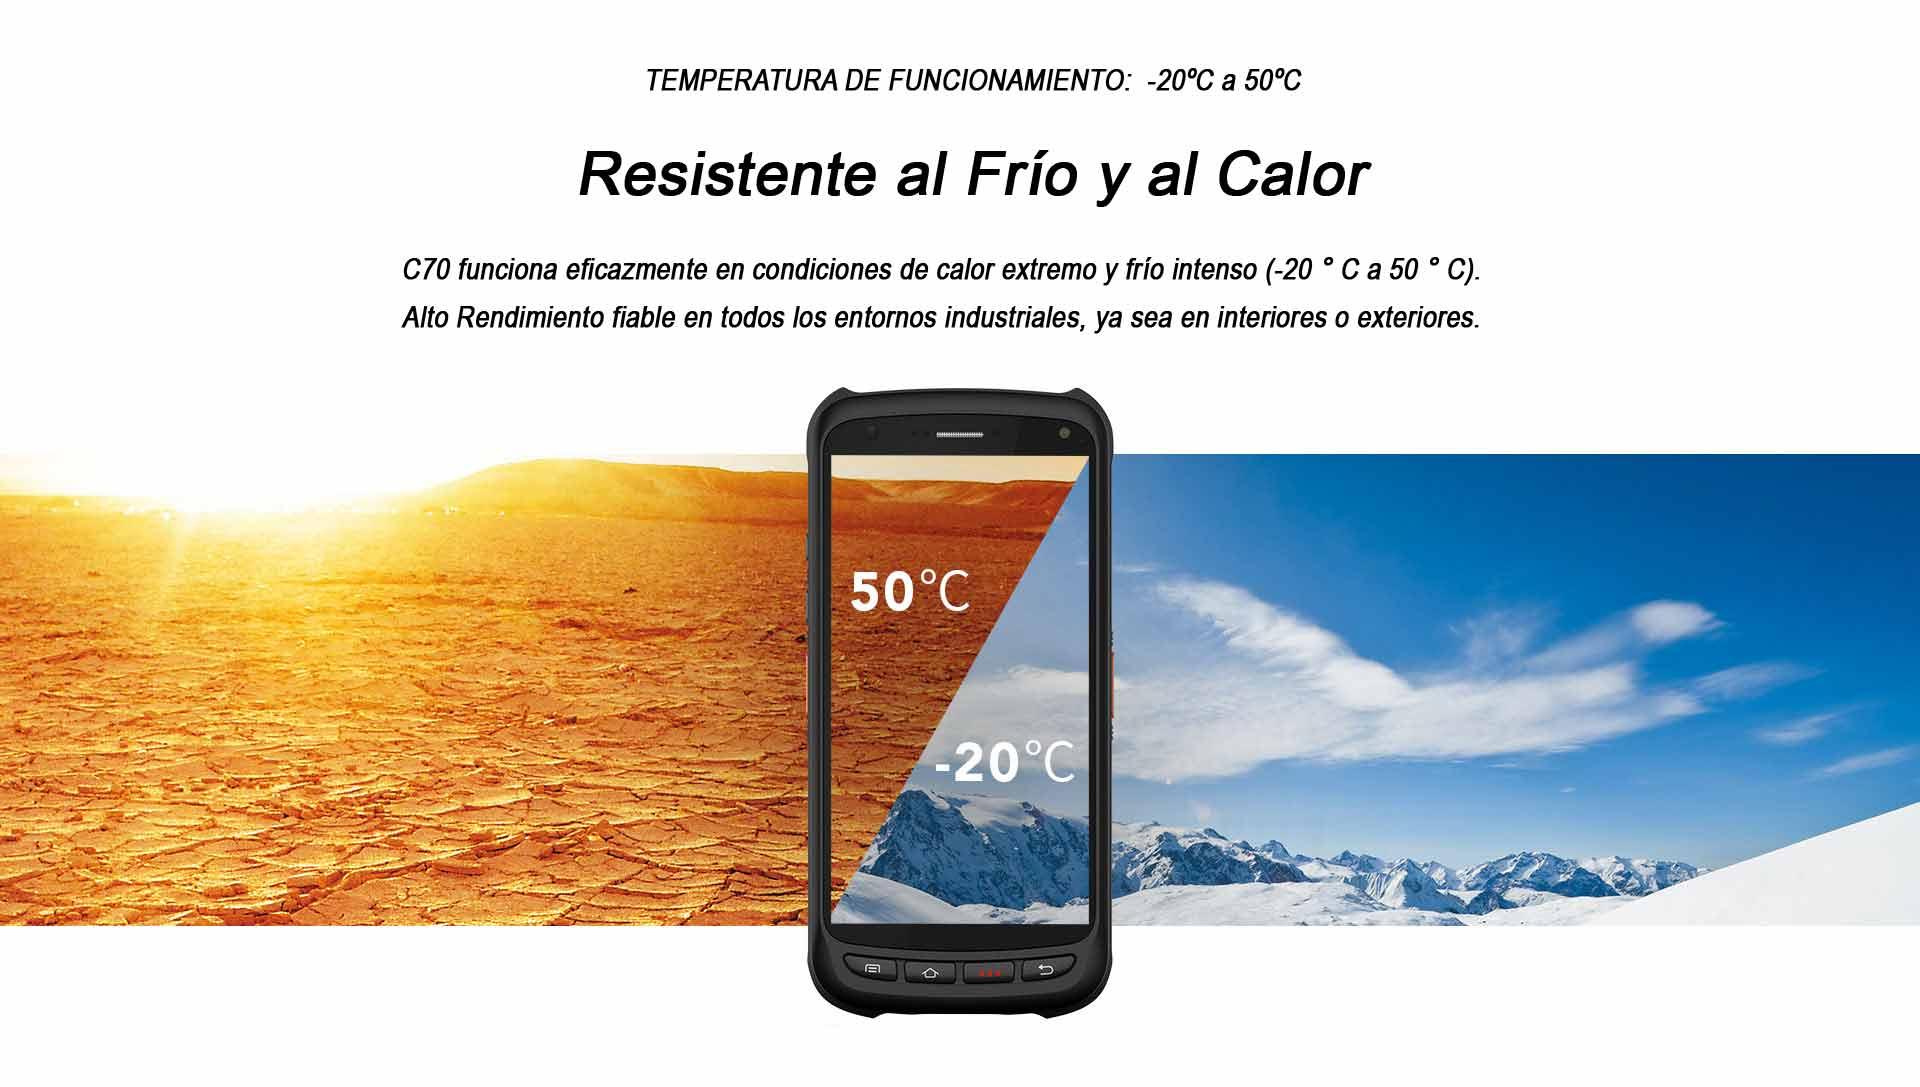 terminal portatil resistente frío y calorC70 Chainway